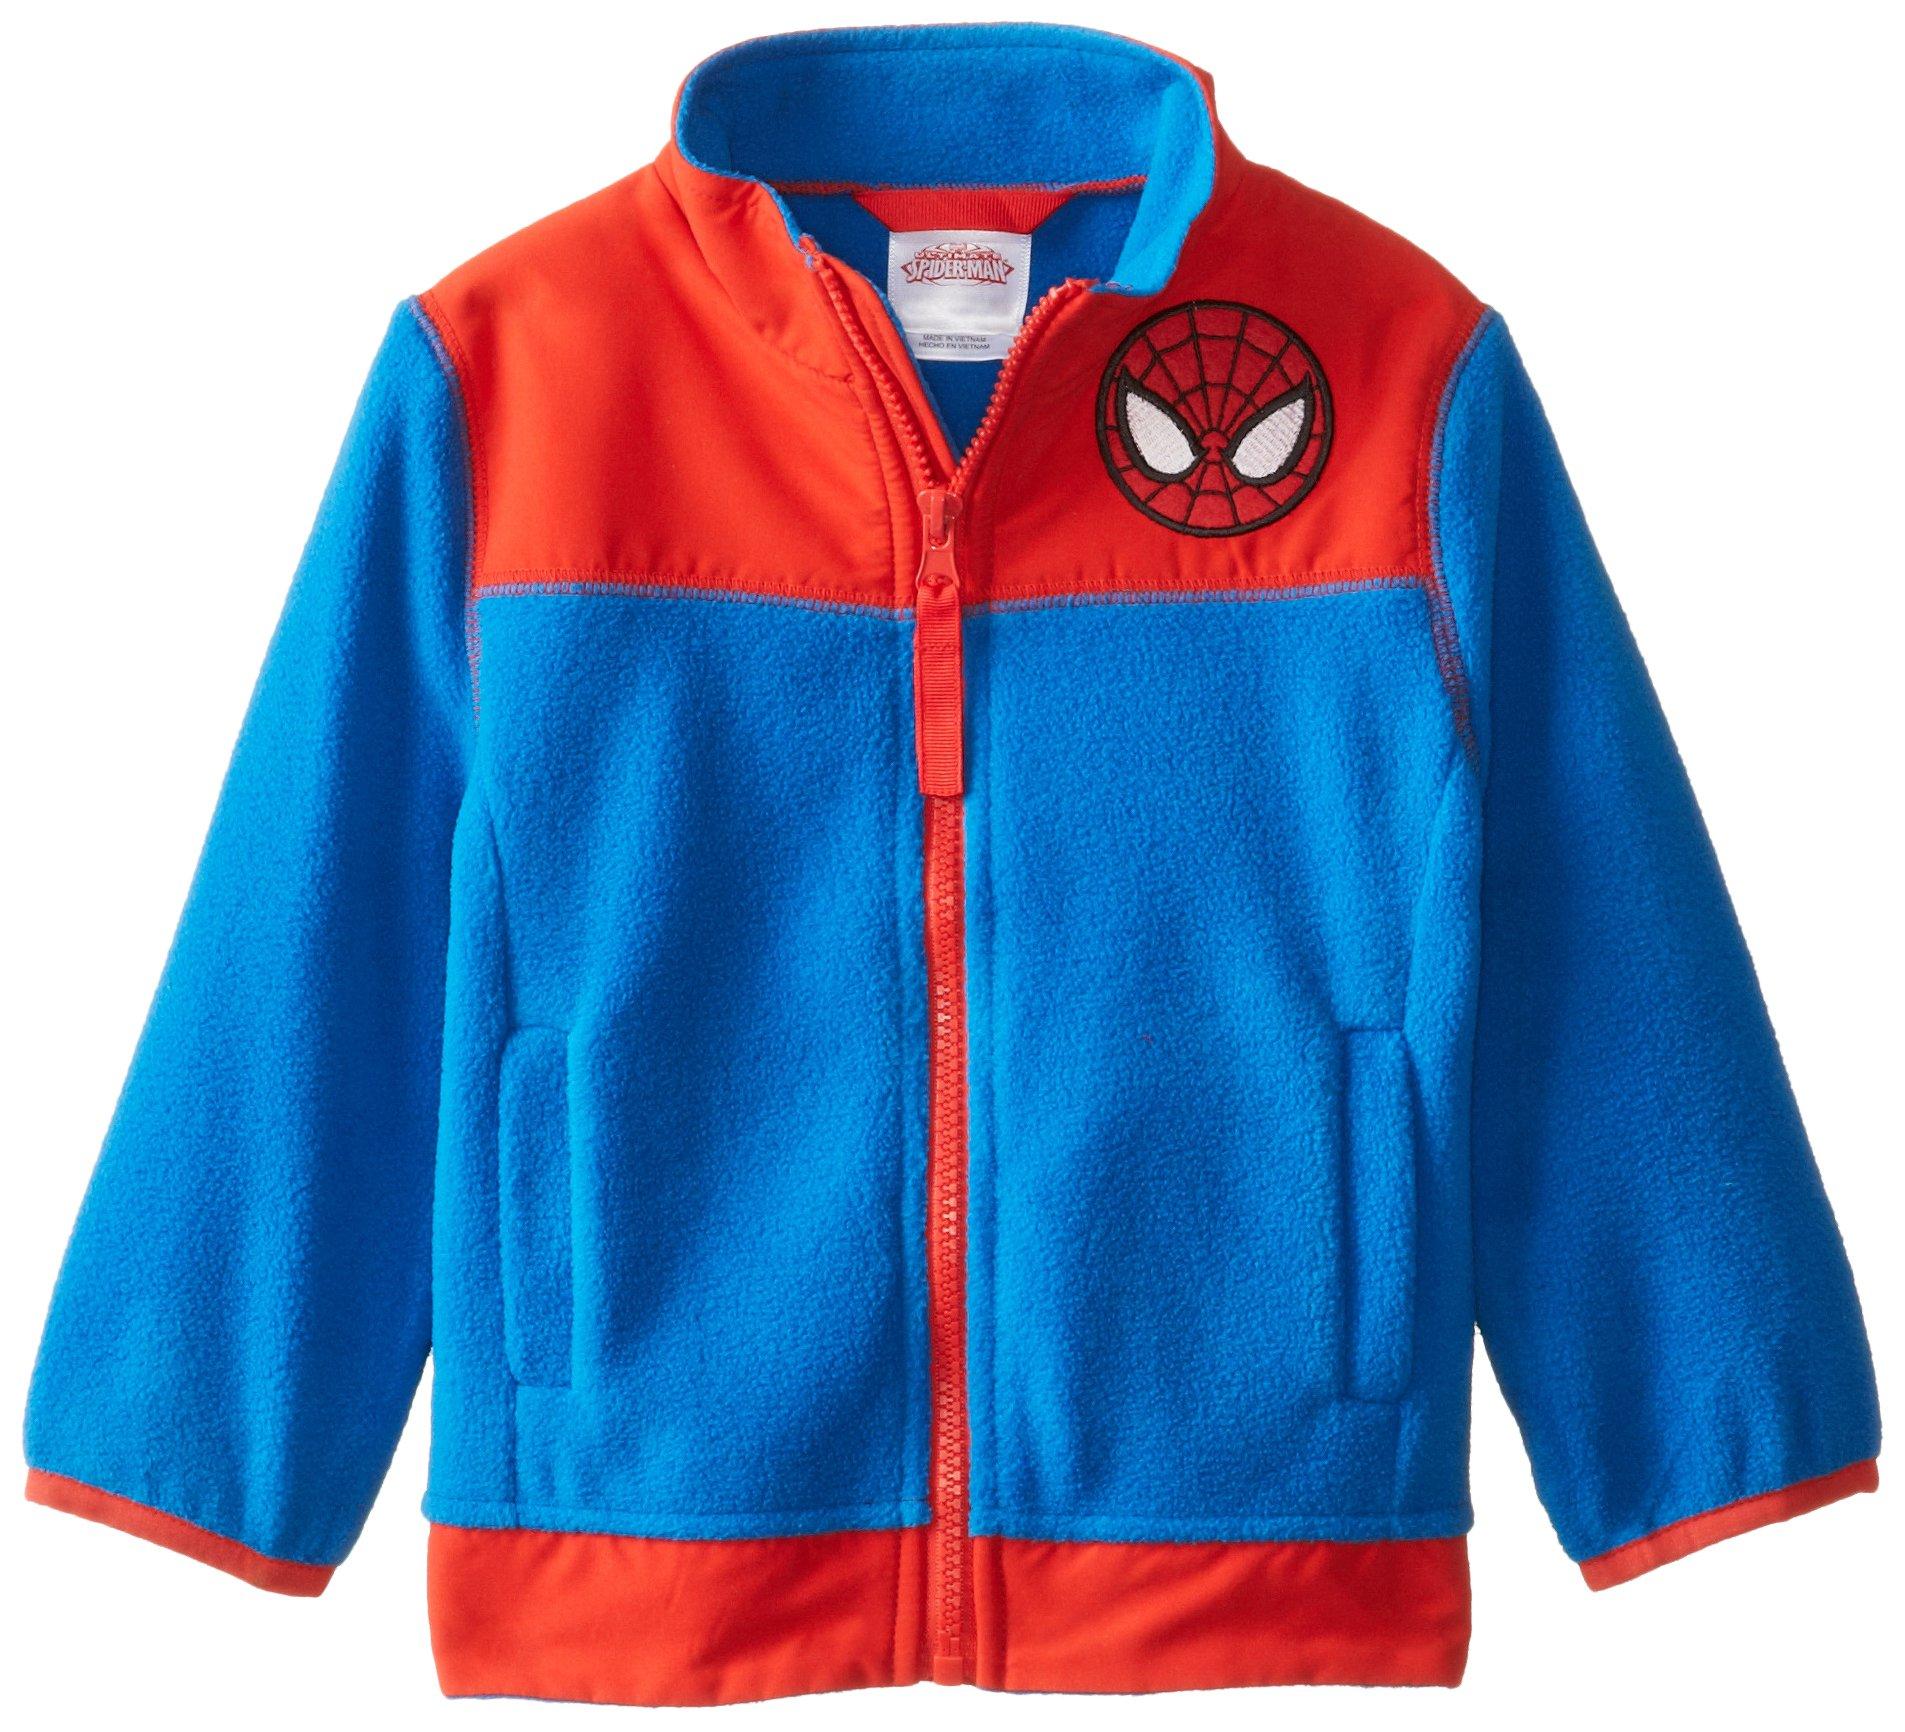 Dreamwave Little Boys' Spiderman Polar Fleece Jacket, Multi, 5T